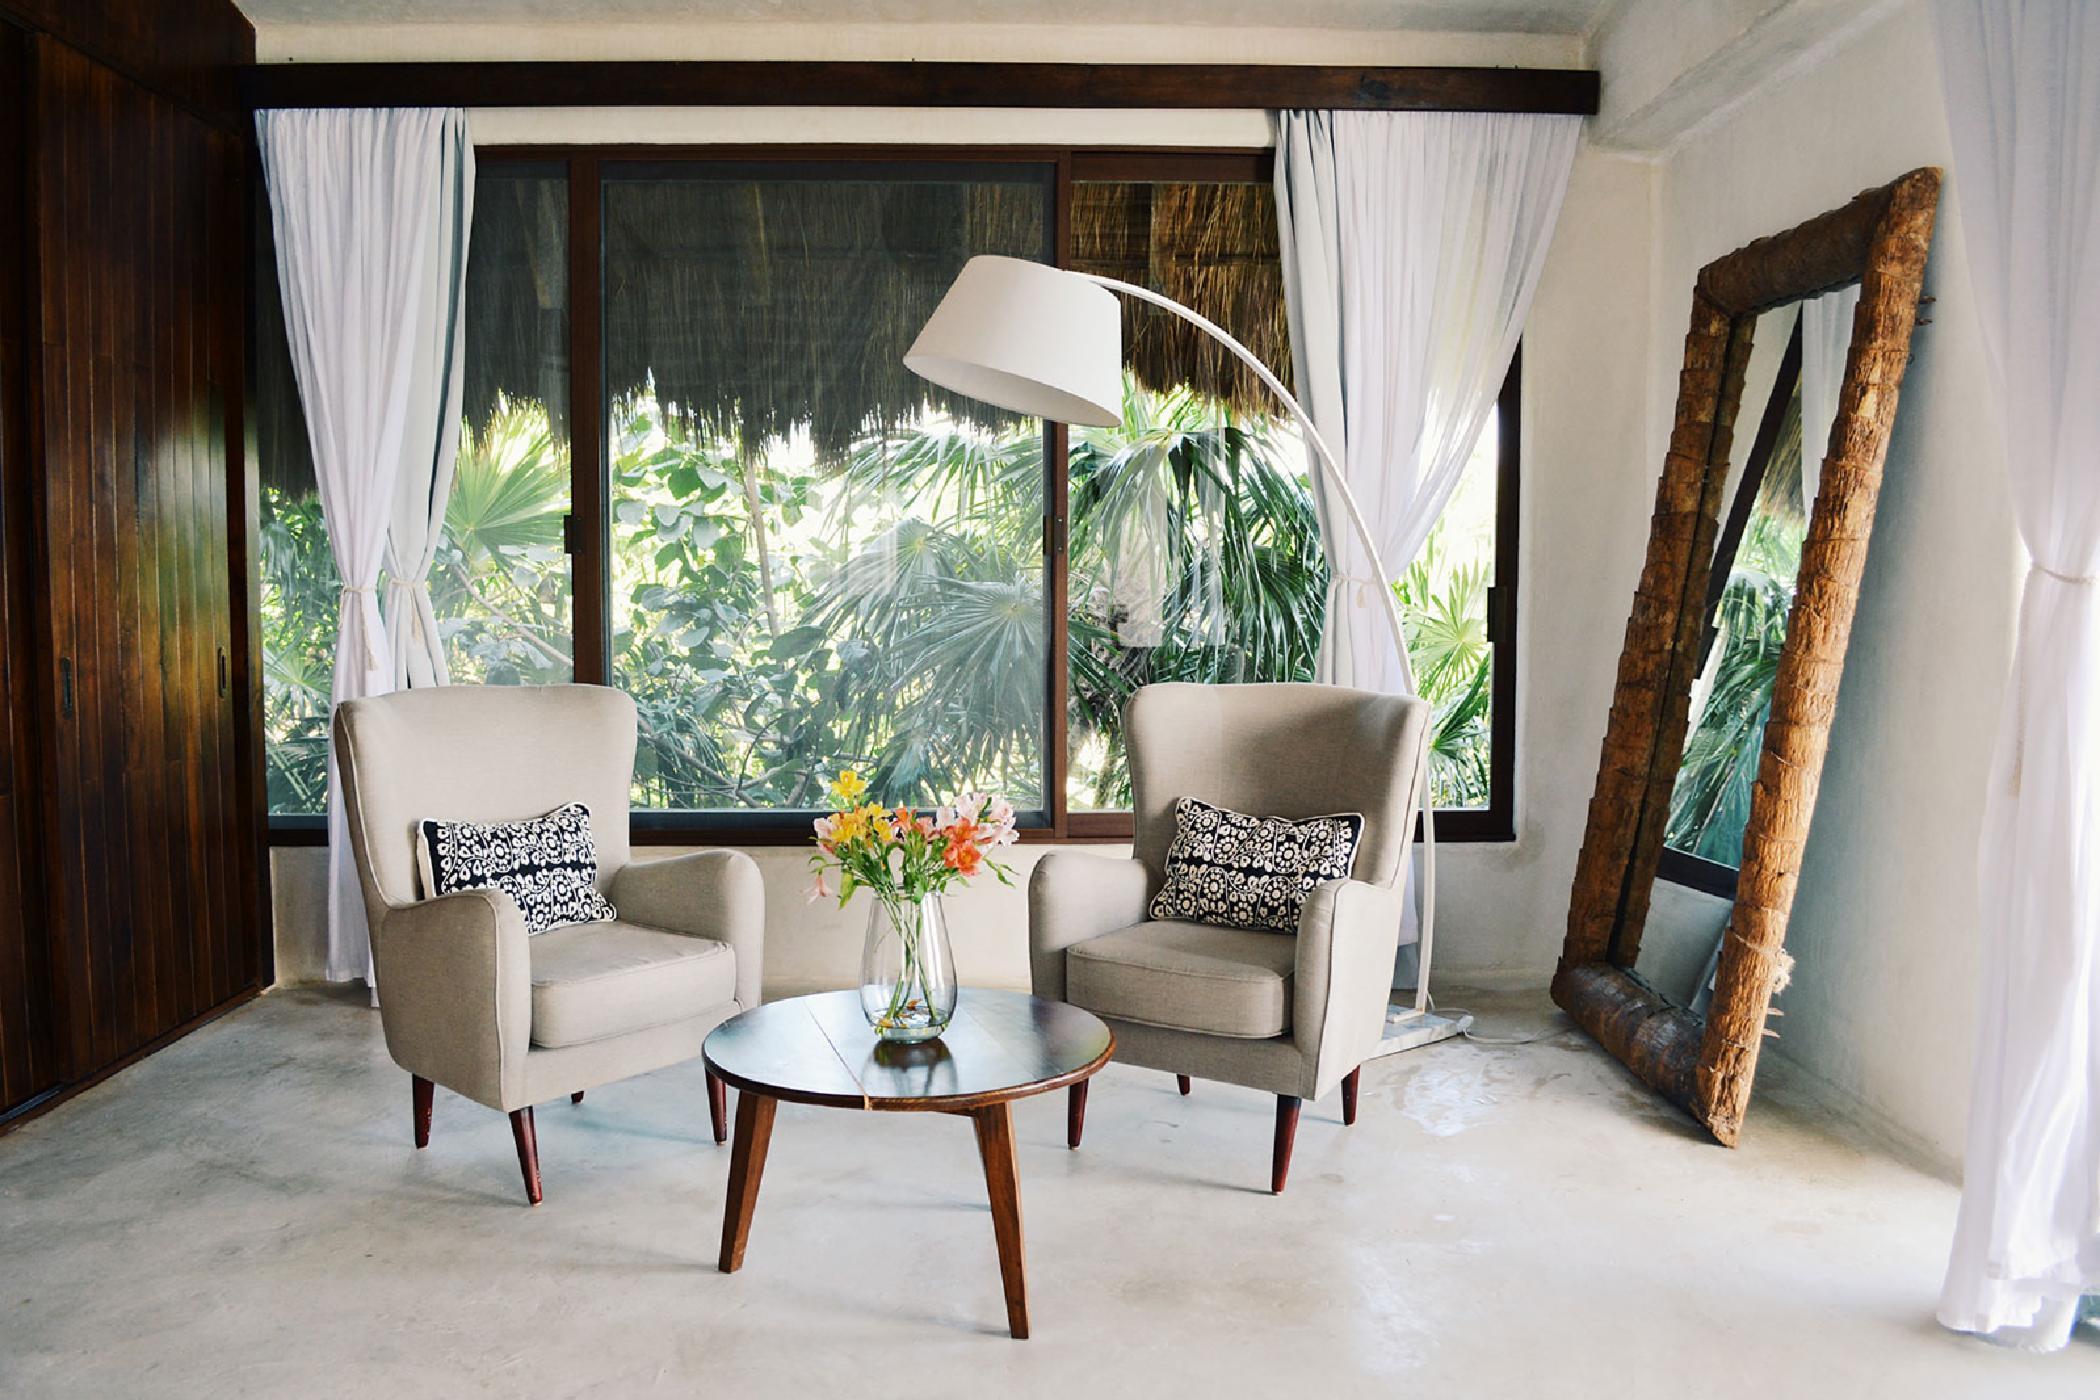 Maya_Luxe_Riviera_Maya_Luxury_Villas_Experiences_Hotel_Zone_Tulum_Beach_5_Bedrooms_Casa_Palapa_12.jpg